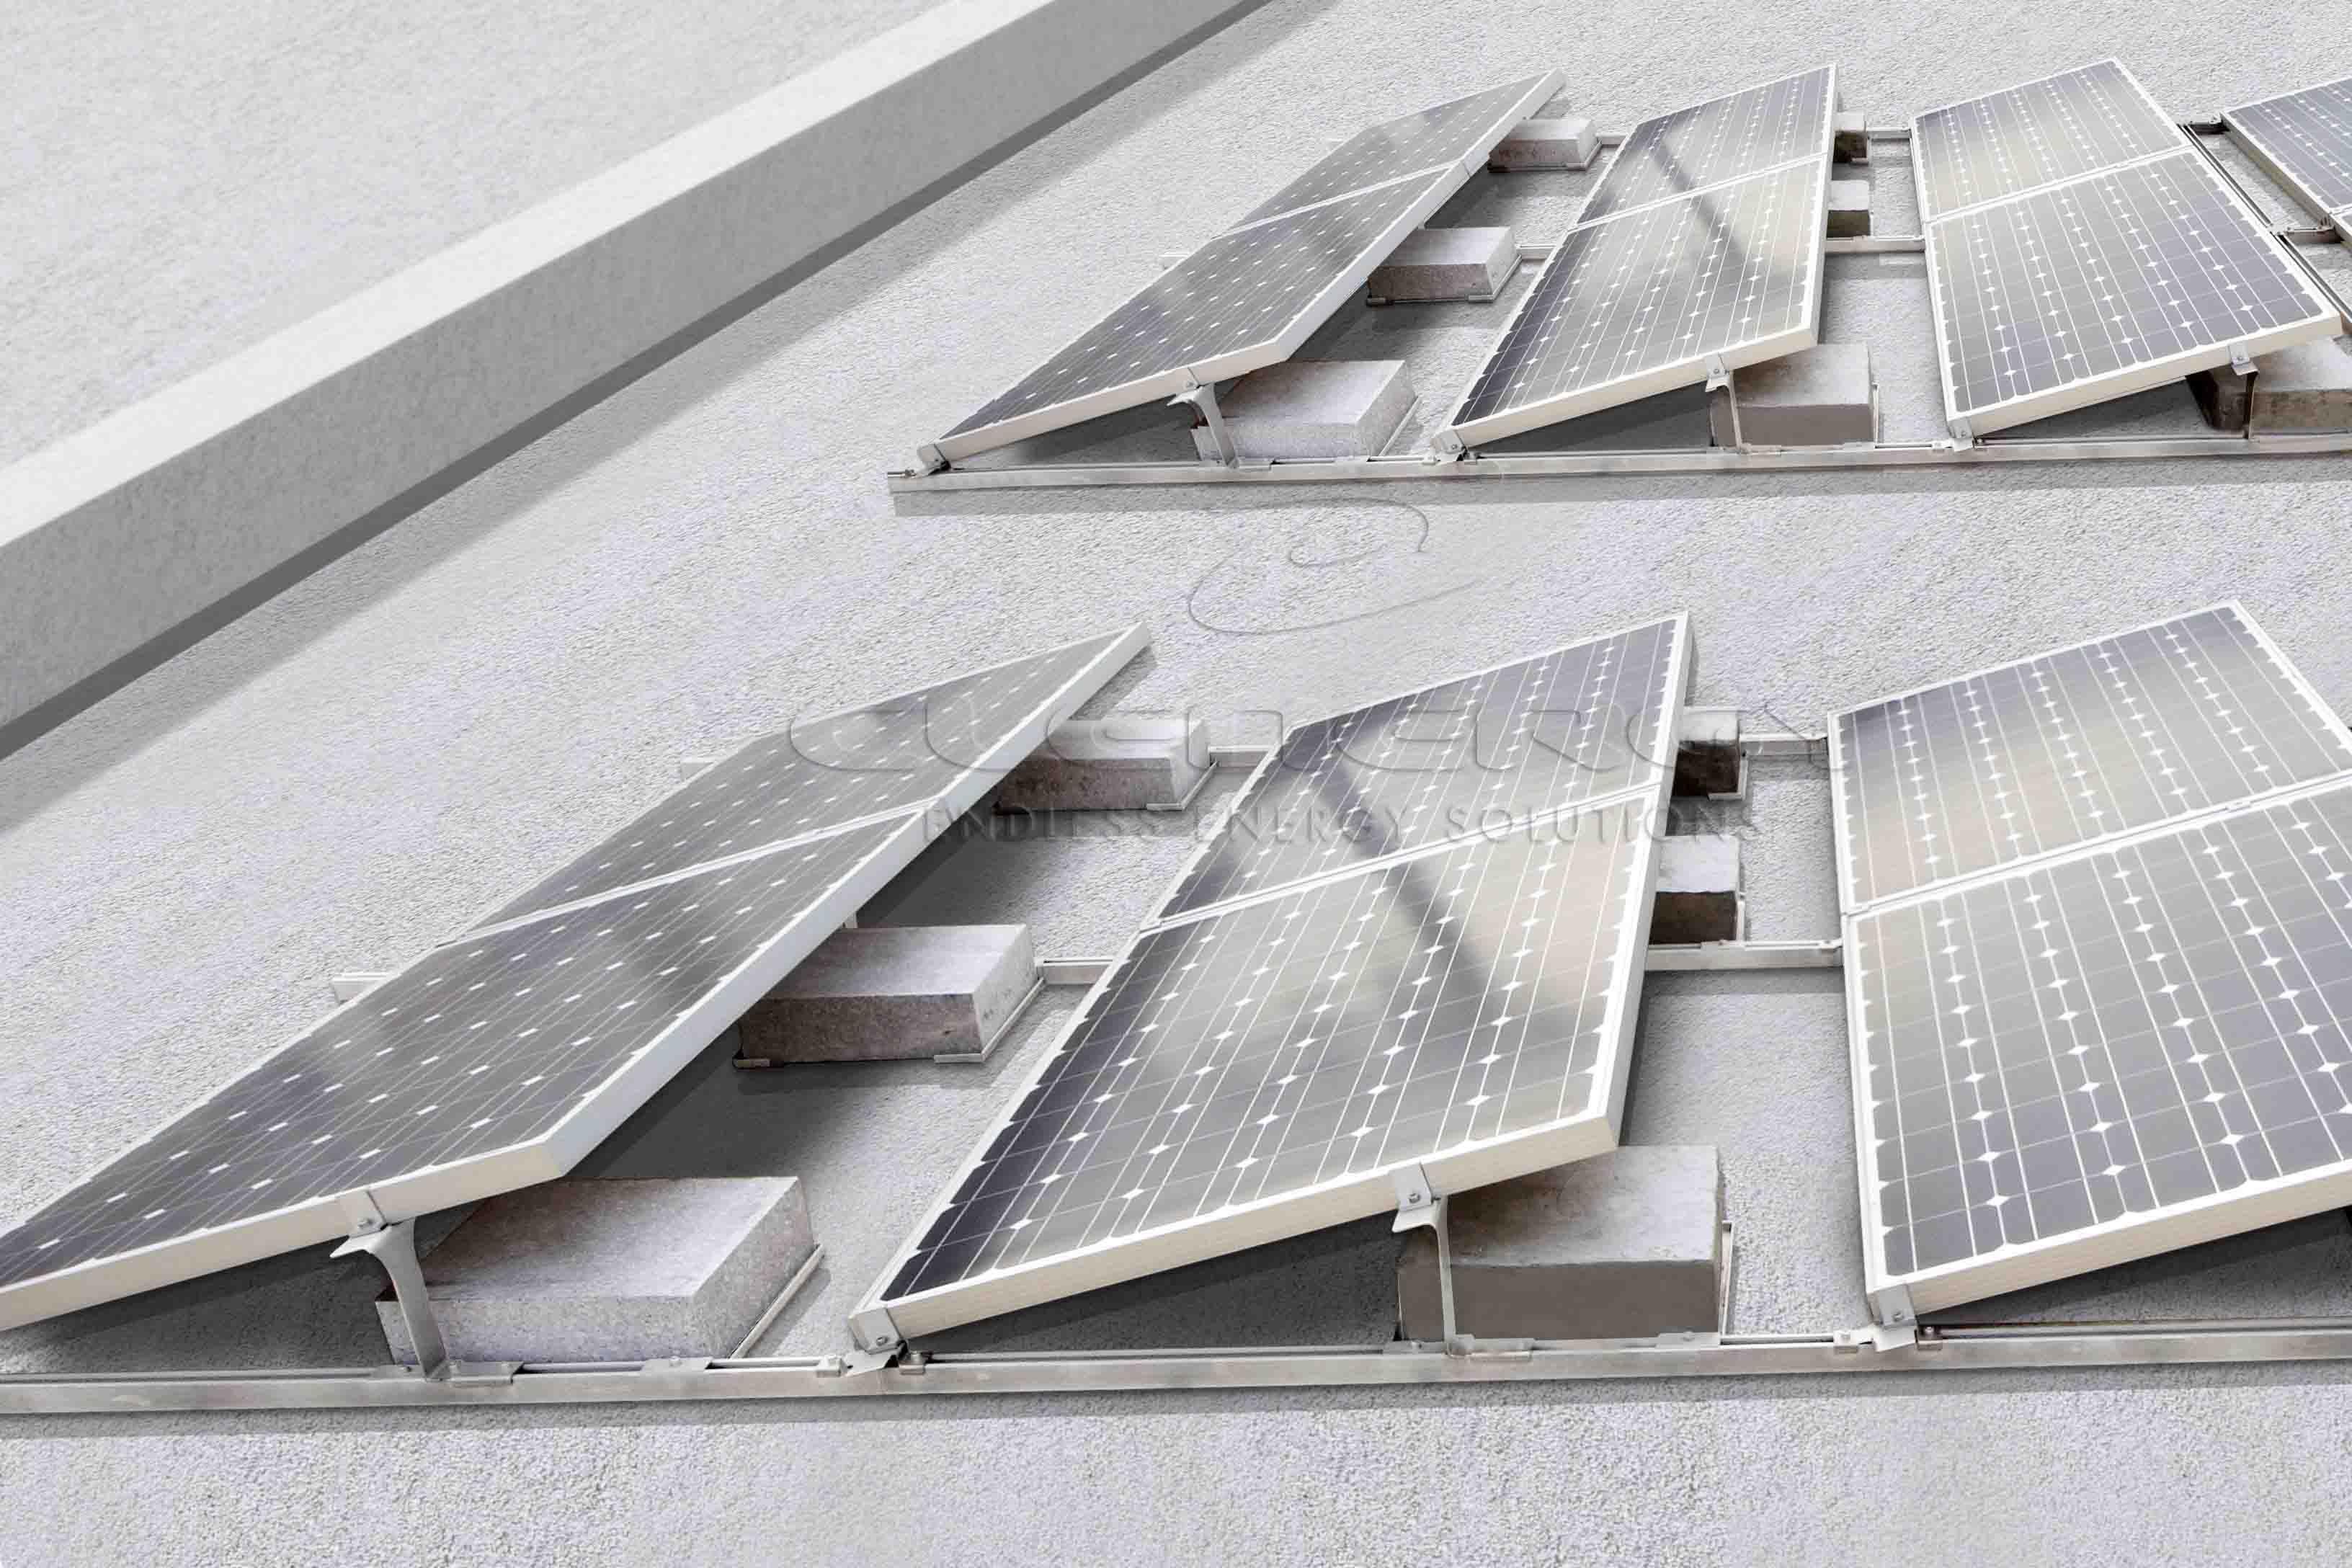 Hot Item Pv Ezrack Solarmatrix Flat Roof Mounting System Flat Roof Solar Panels Roof Flat Roof Systems